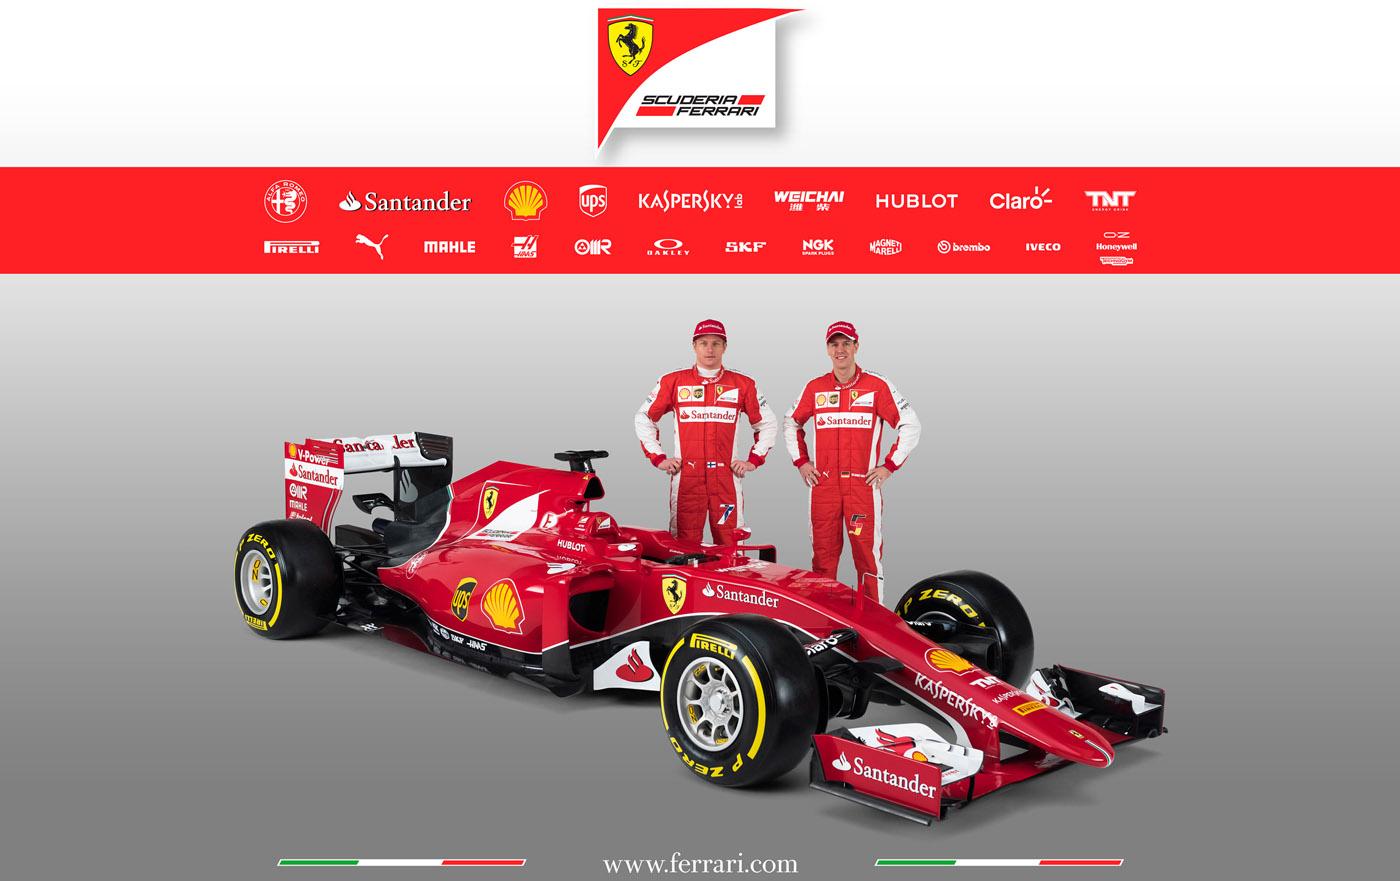 Scuderia Ferrari SF15-T Kimi Raikkonen Sebastian Vettel